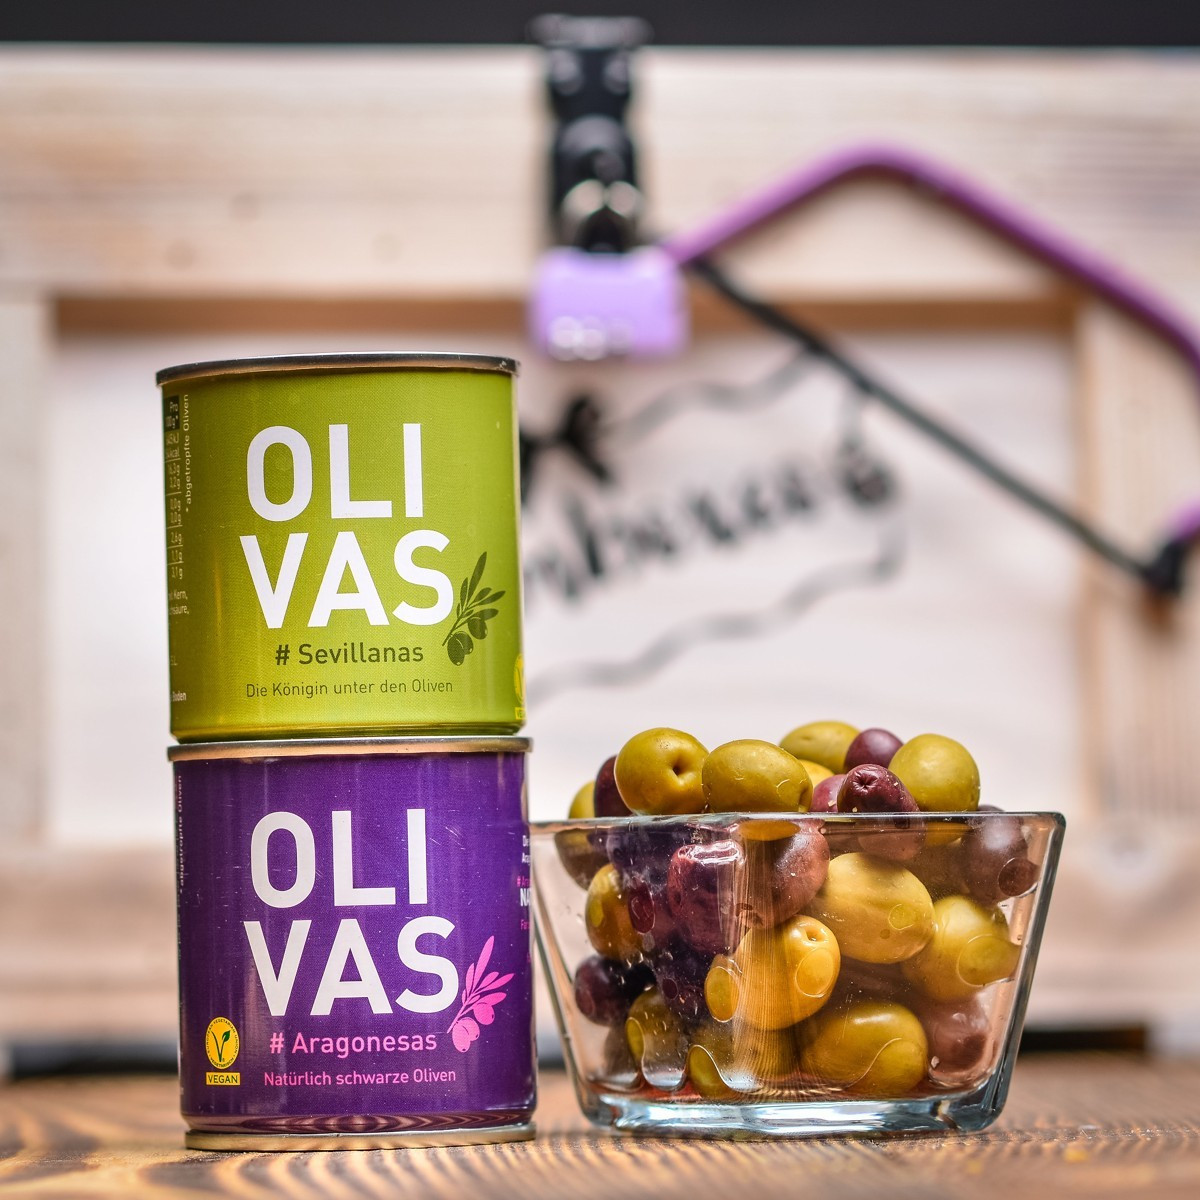 zelene olivy olivas sevillanas a cerne olivy olivas saragonesas 80 g.JPG